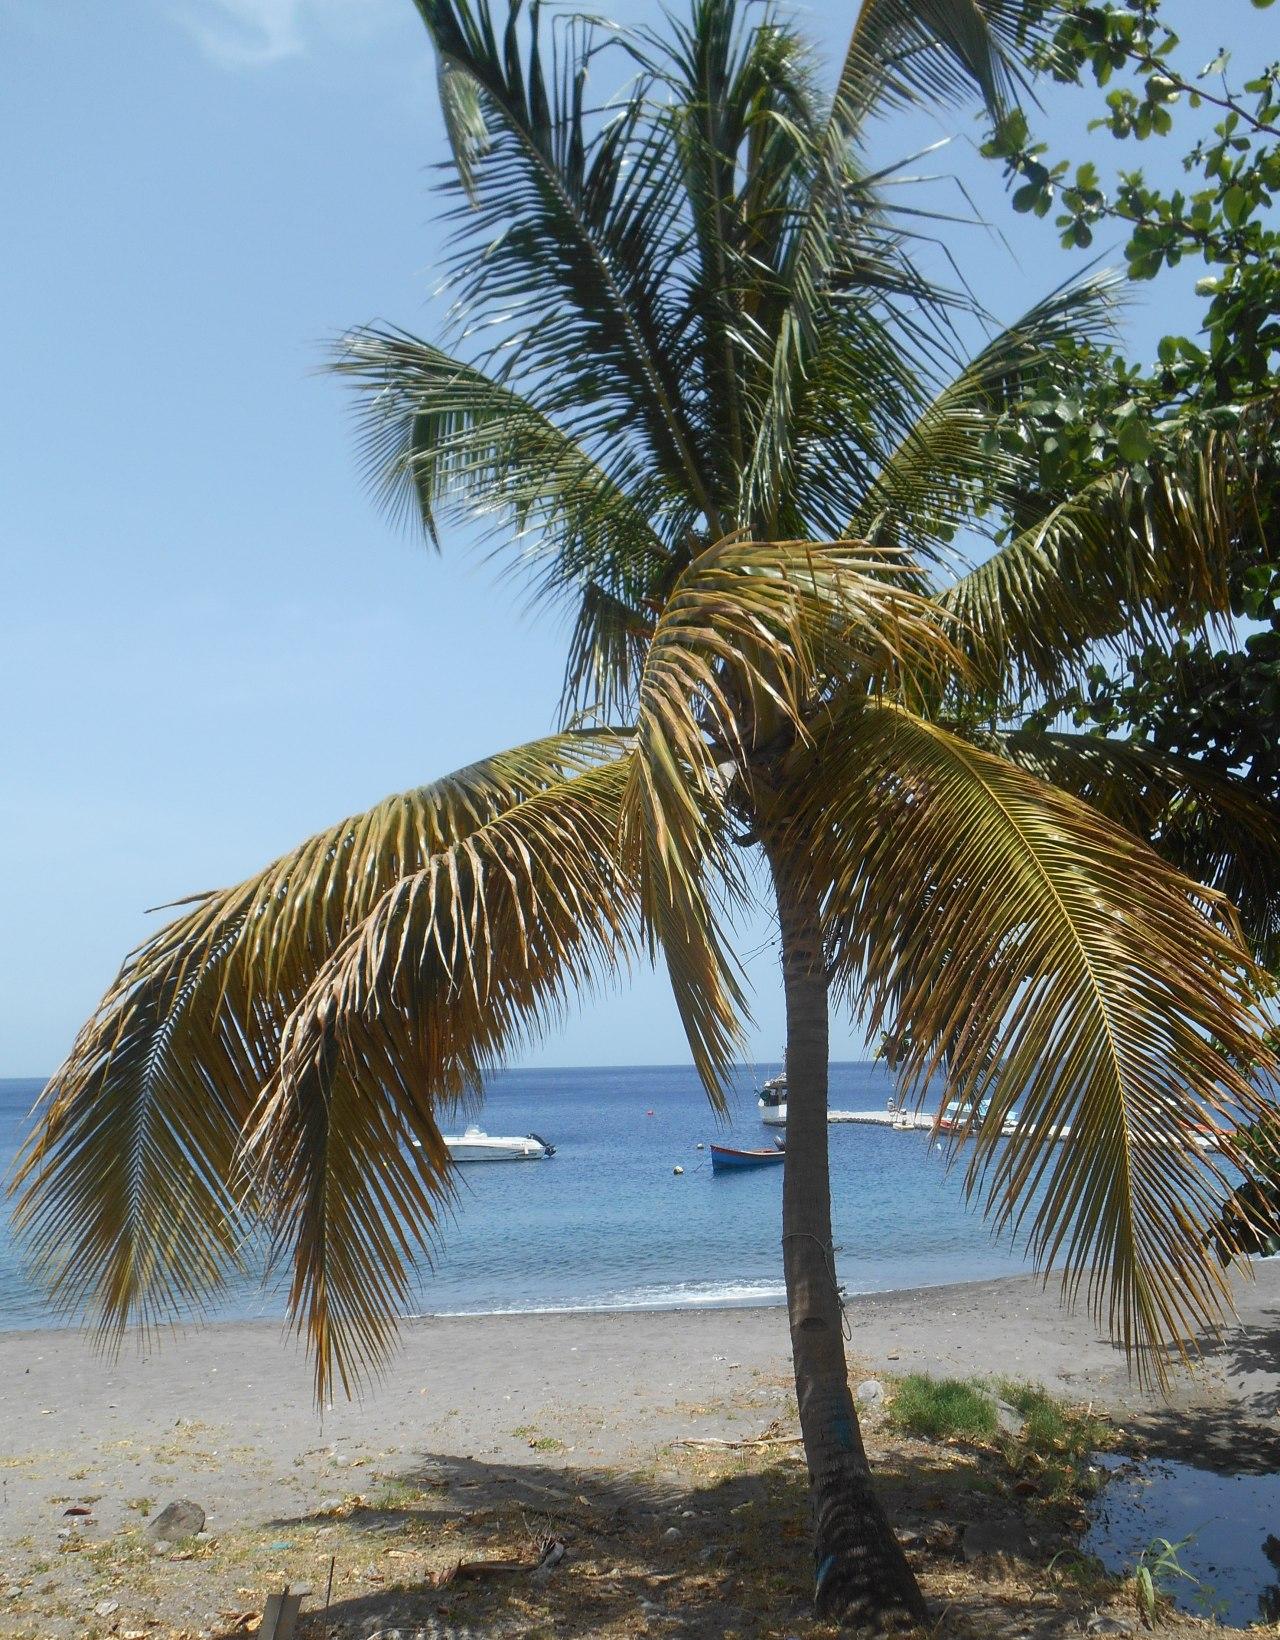 palmier-saint-pierre.jpg